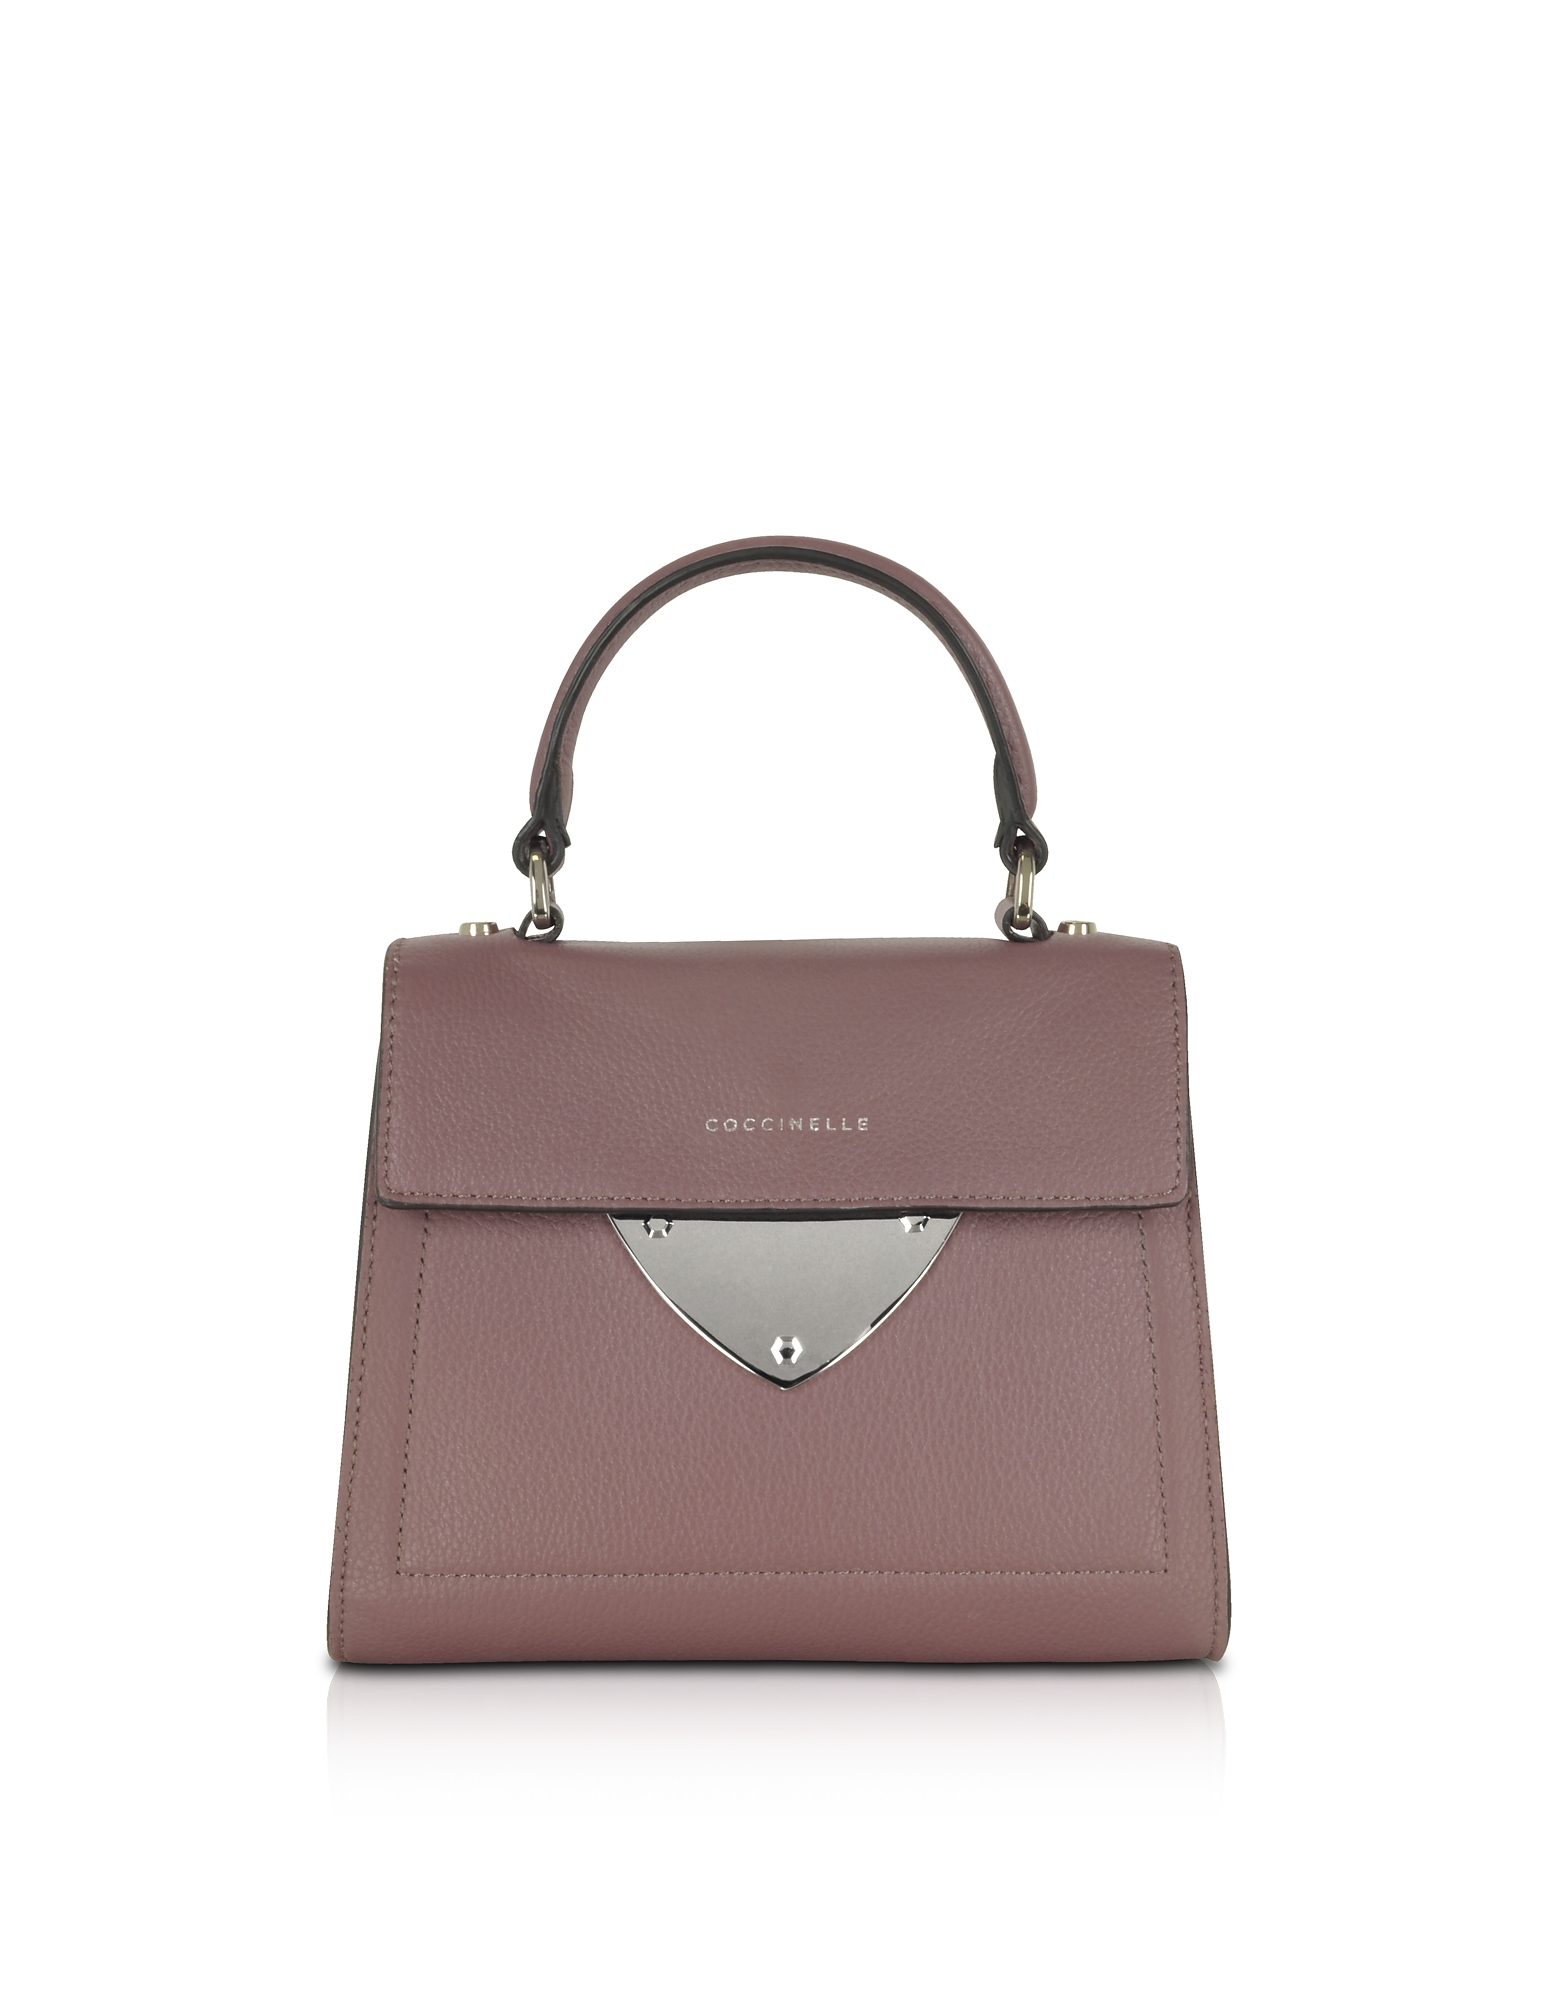 Coccinelle Handbags, B14 Mini Leather Satchel Bag